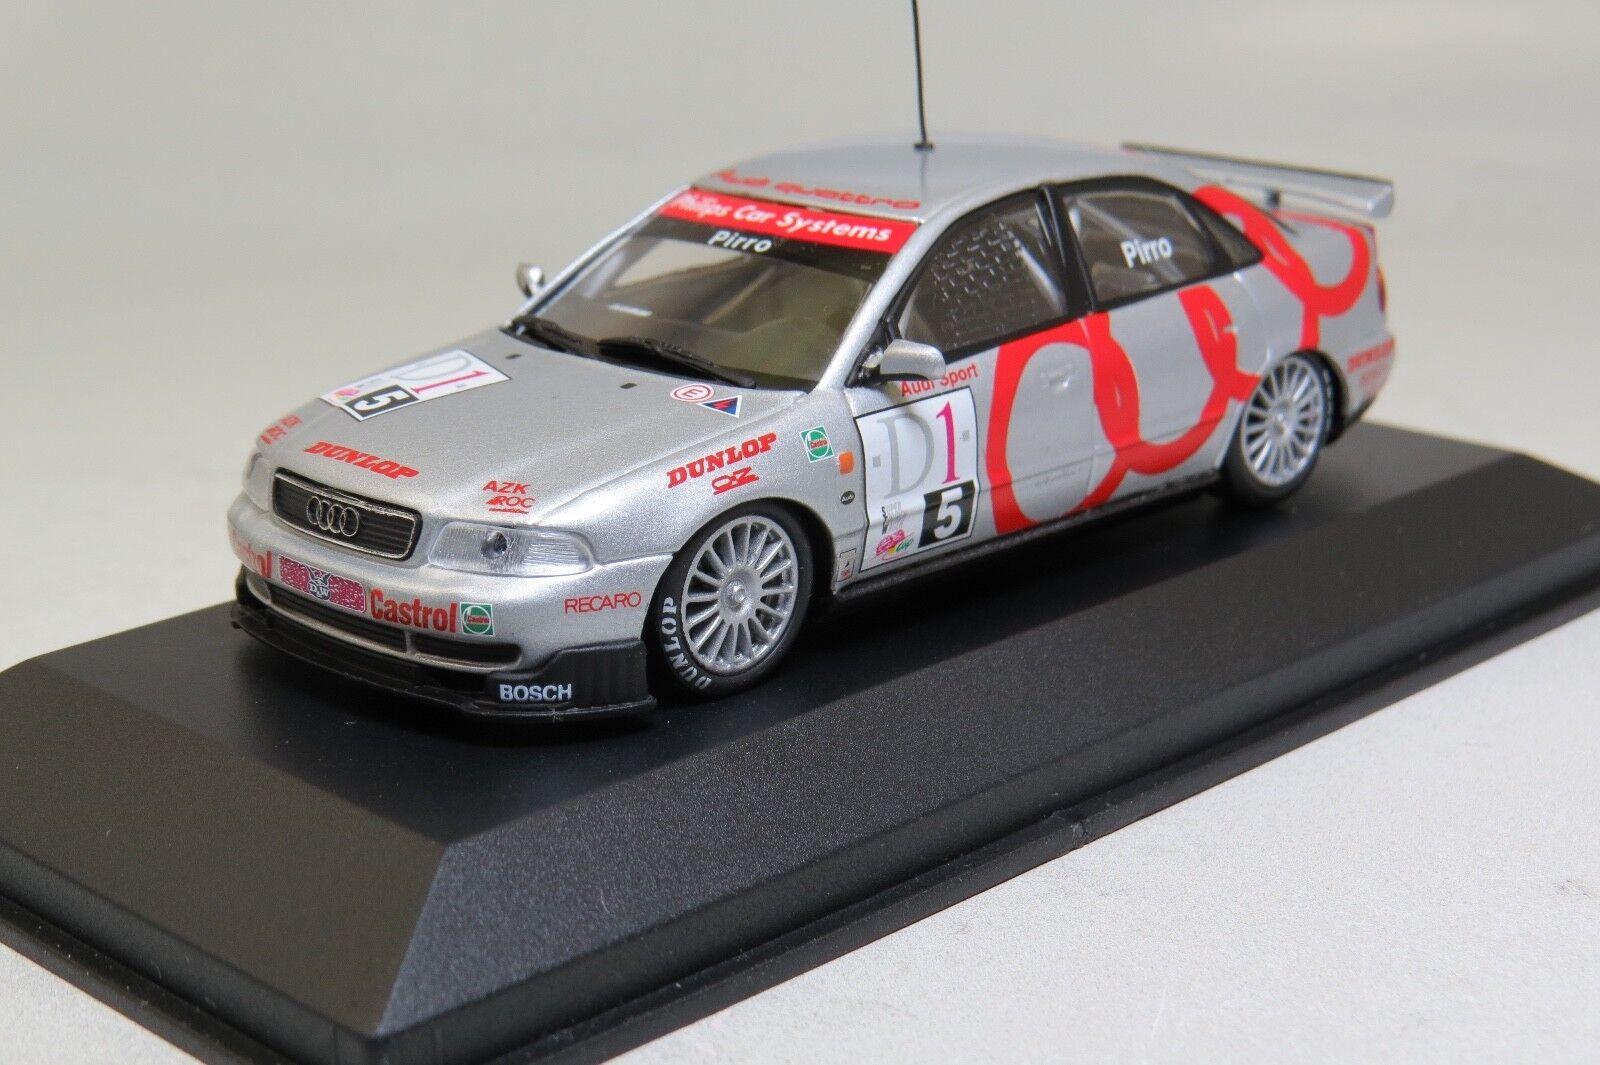 MINICHAMPS 430961505 1 43 Audi A4 STW Cup 1996 E. Pirro NEW